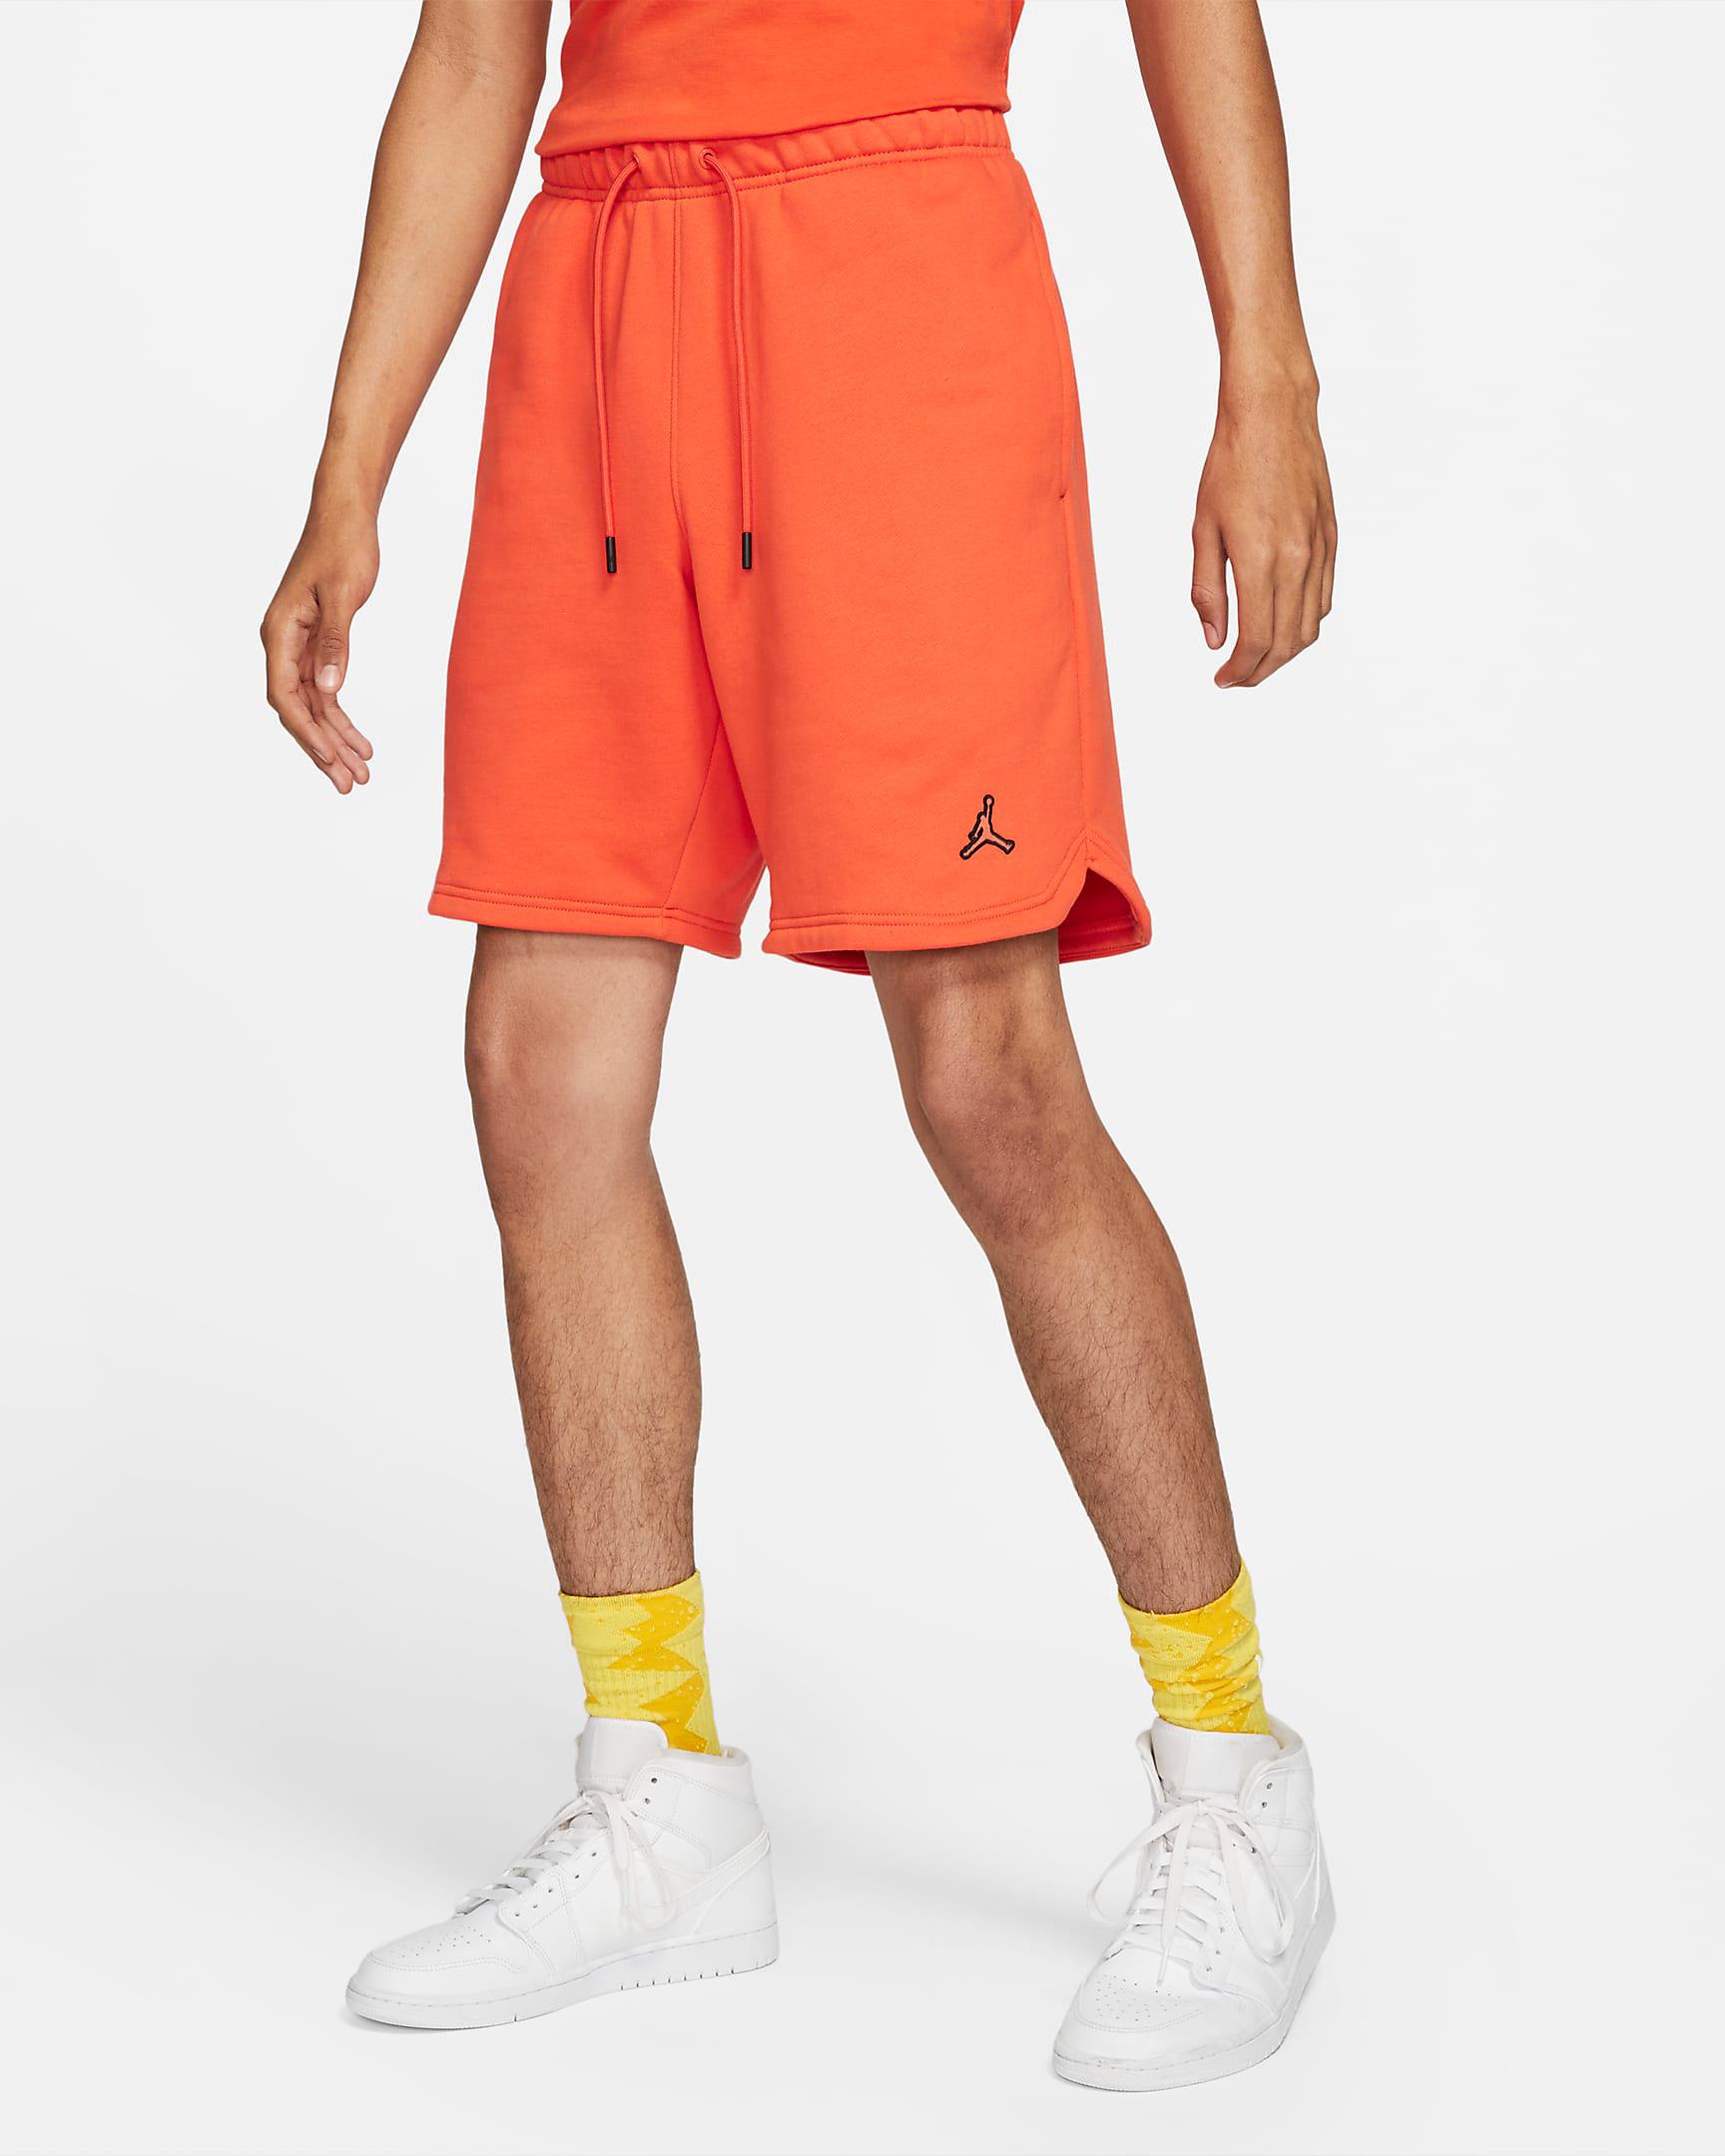 jordan-orange-essential-fleece-shorts-1